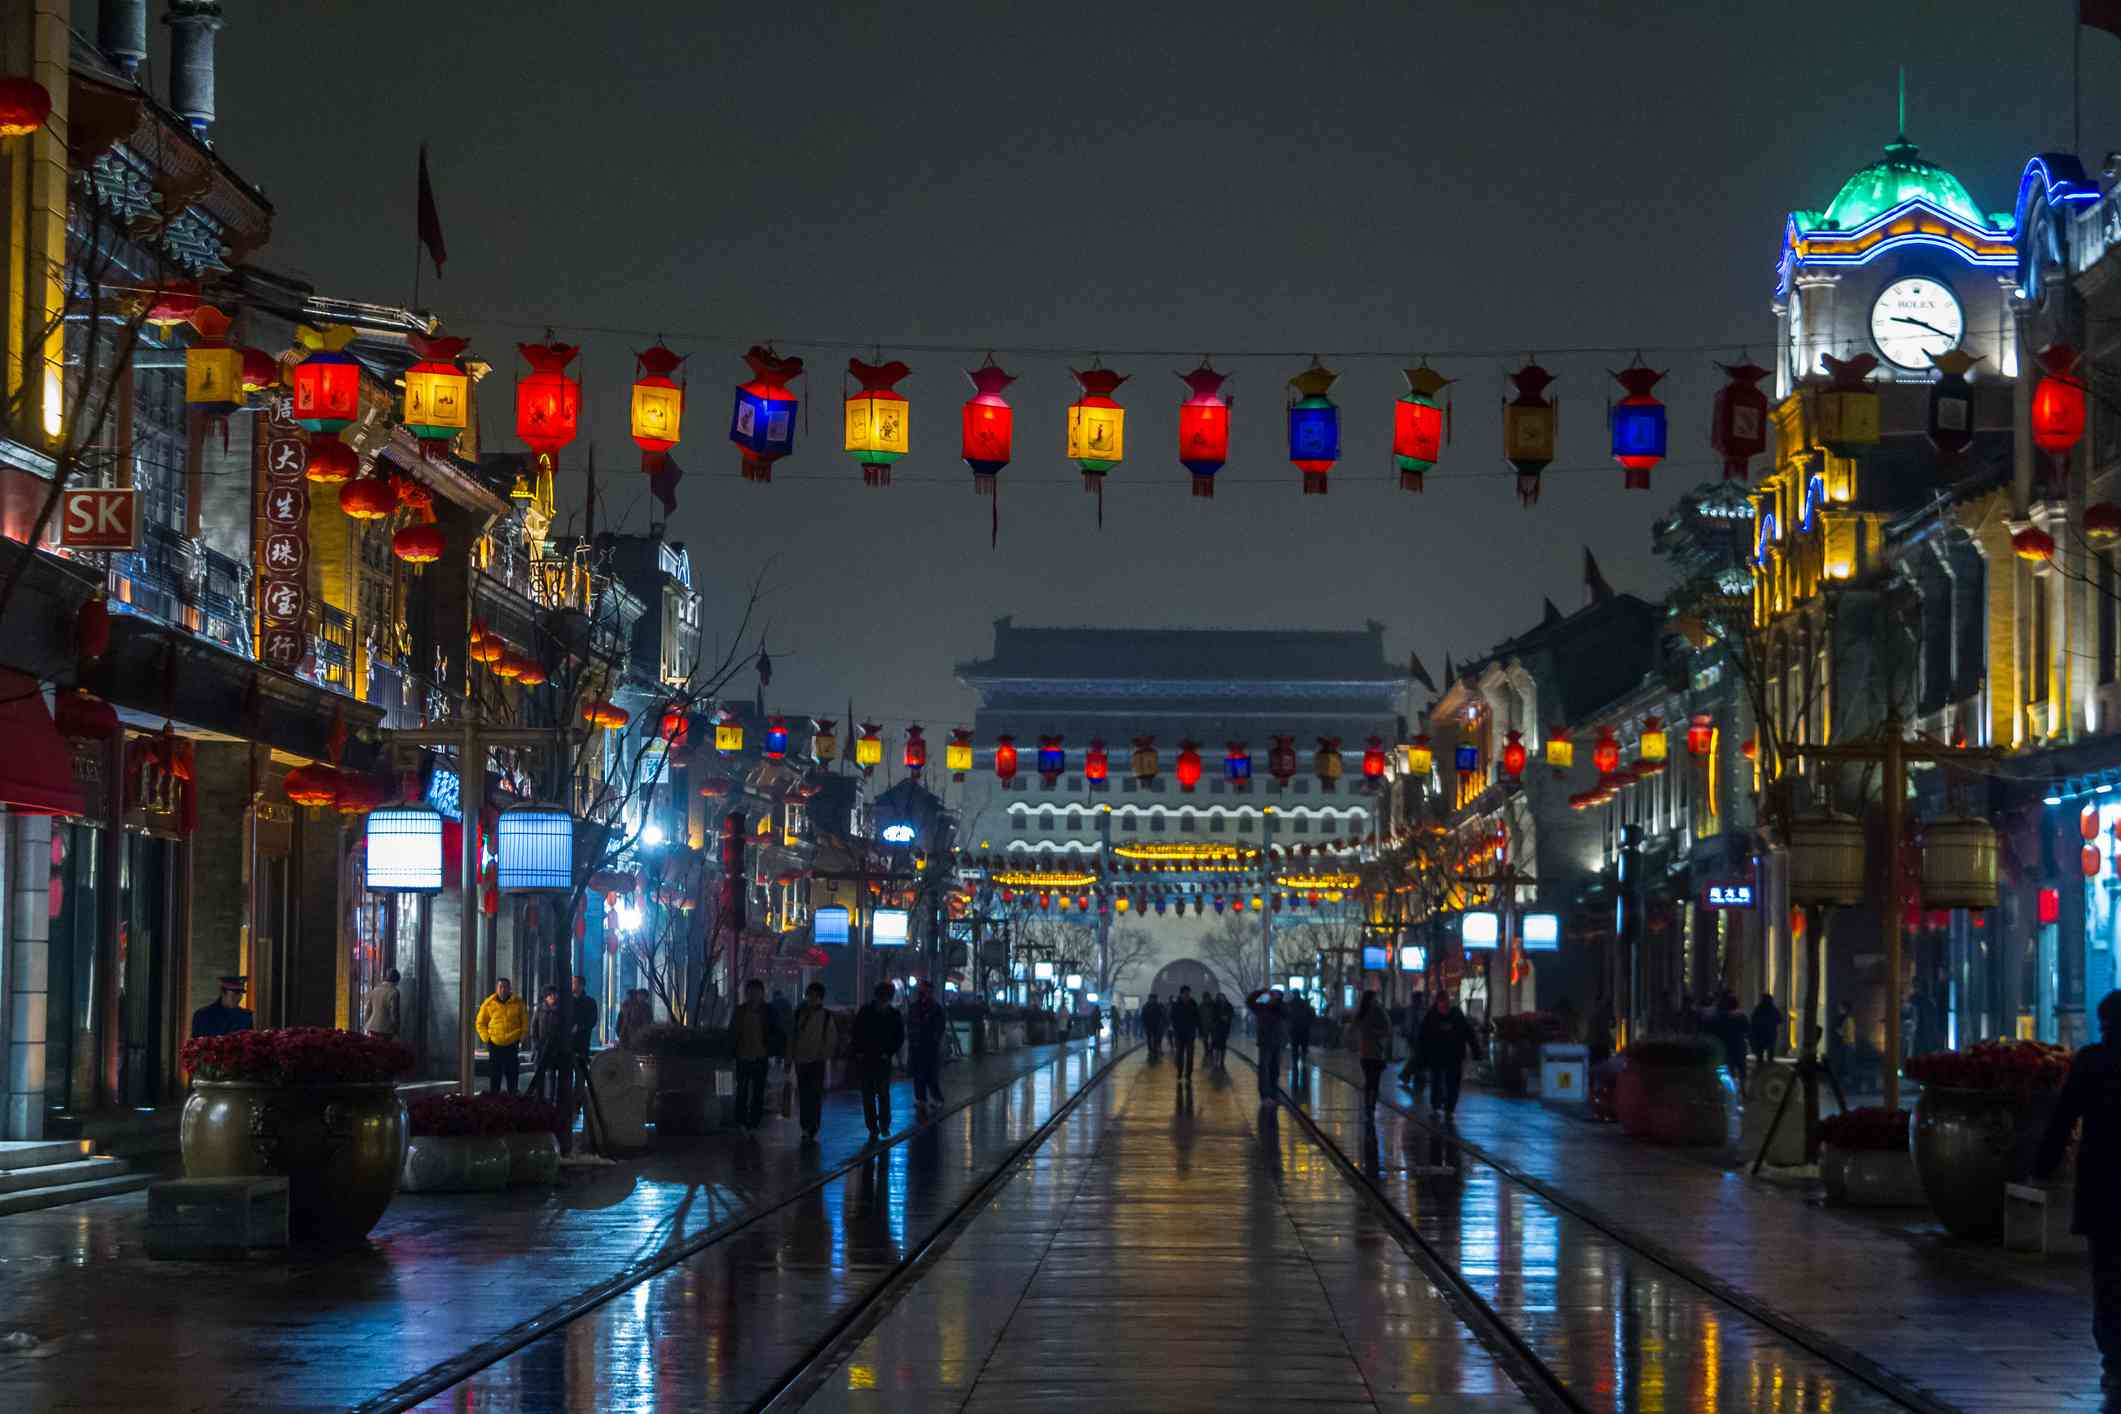 Qianmen Pedestrian Street at Night